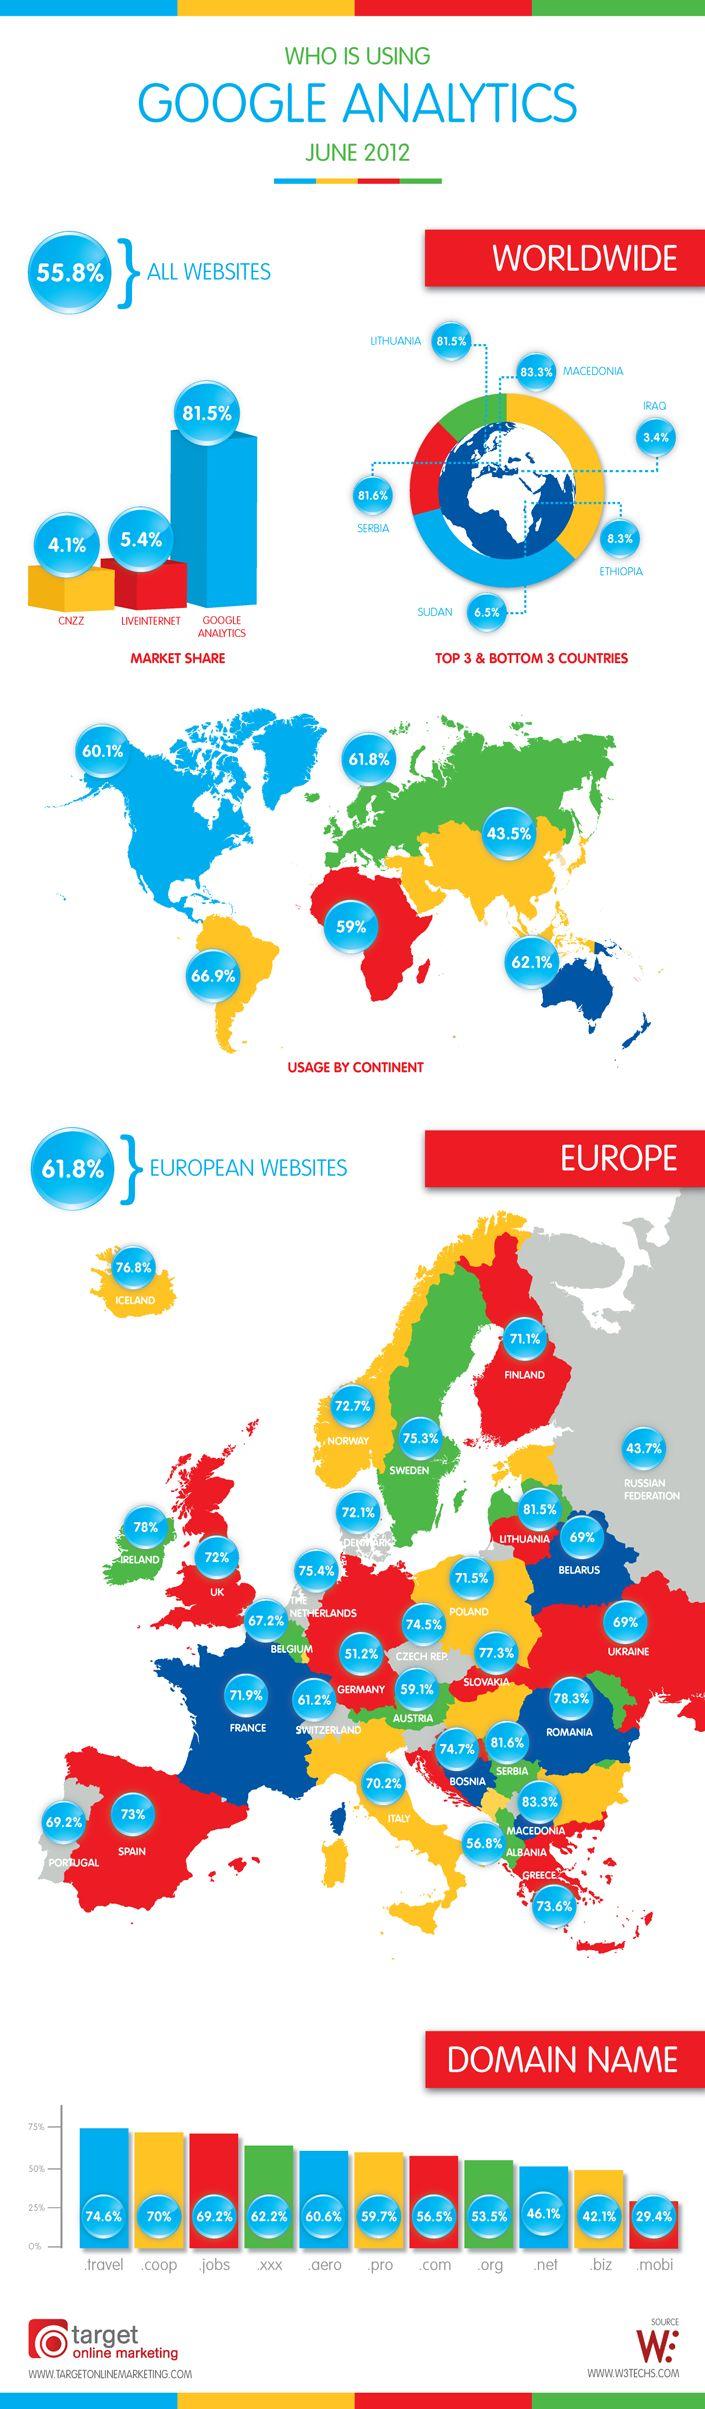 Infographic on the usage of Google Analytics